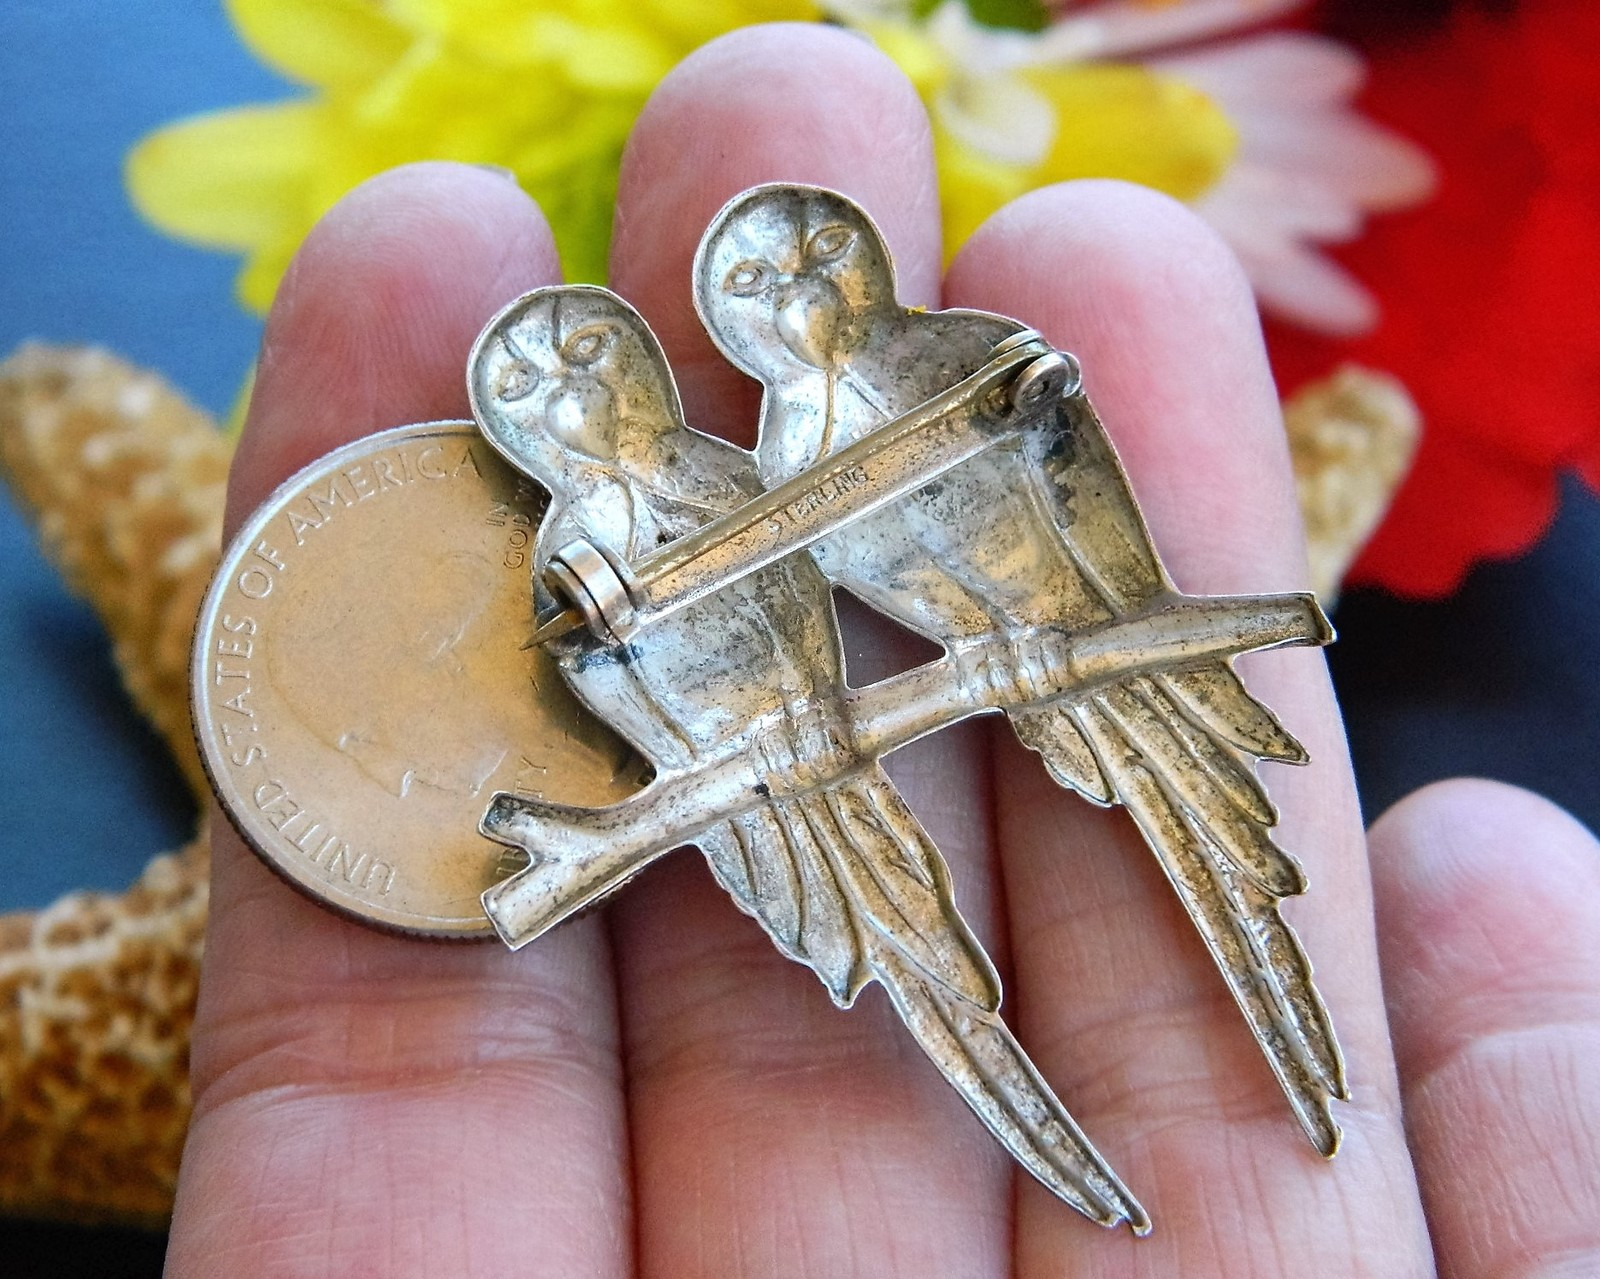 Vintage Parrot Brooch Pin 2 Love Birds Branch Sterling Silver Figural